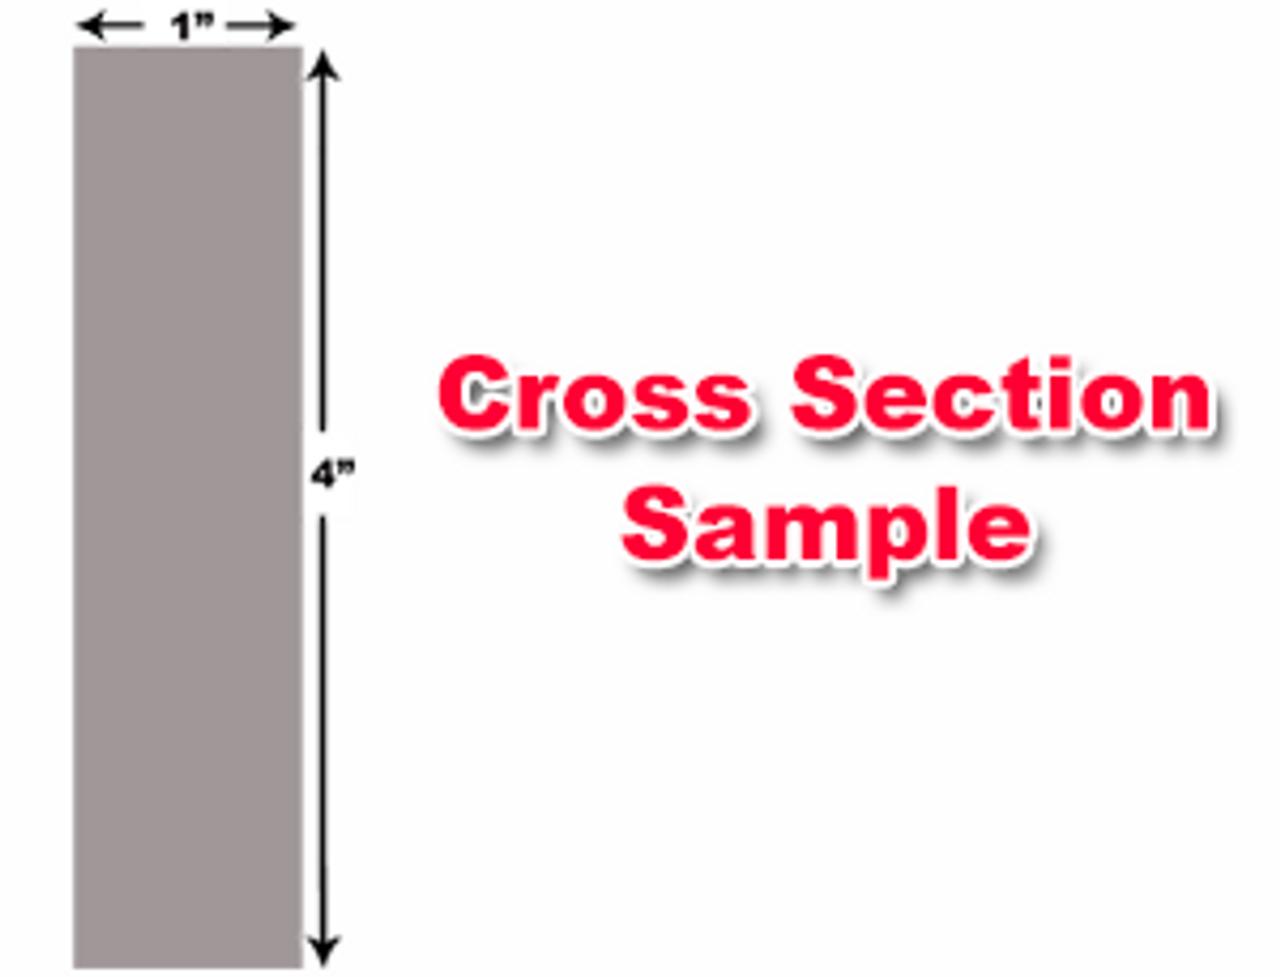 "Cincinnati Shear Knives - 148"" Length, 4"" x 1"" Cross Section (239807) Type S"